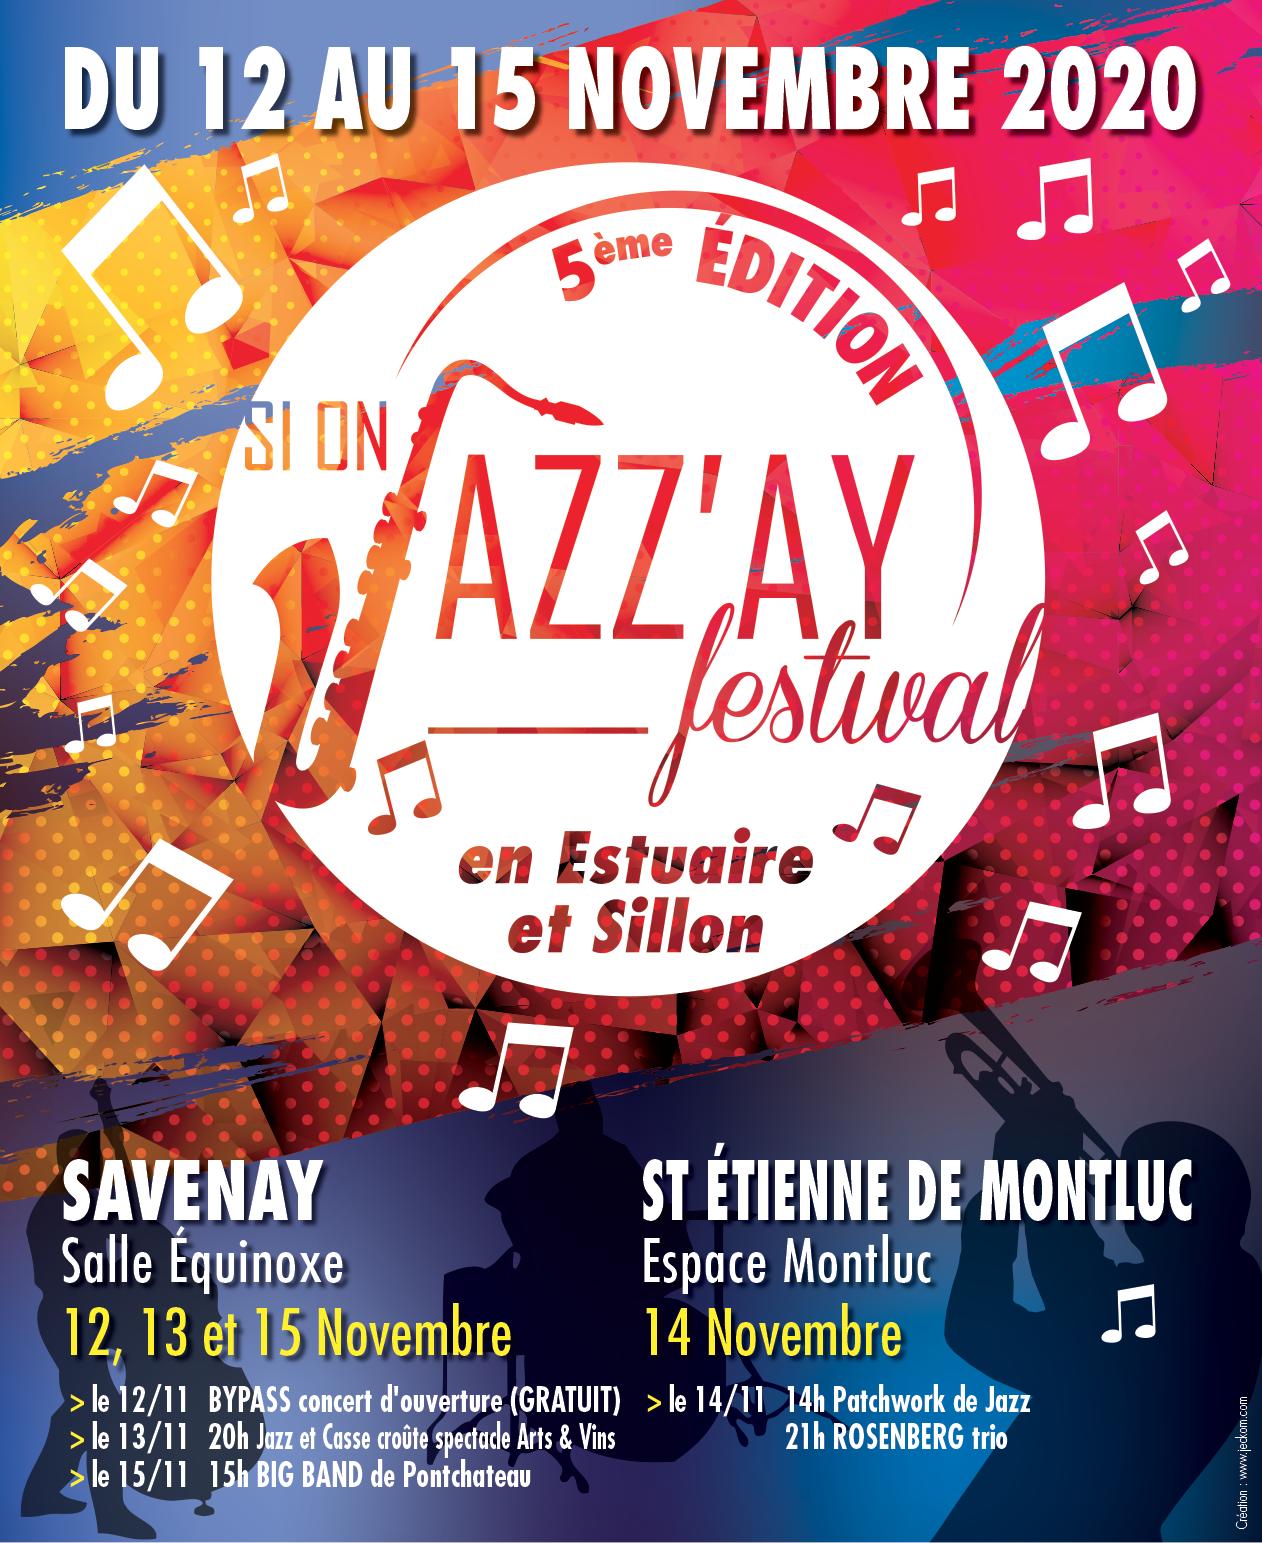 Programme Si On Jazz'ay 2020